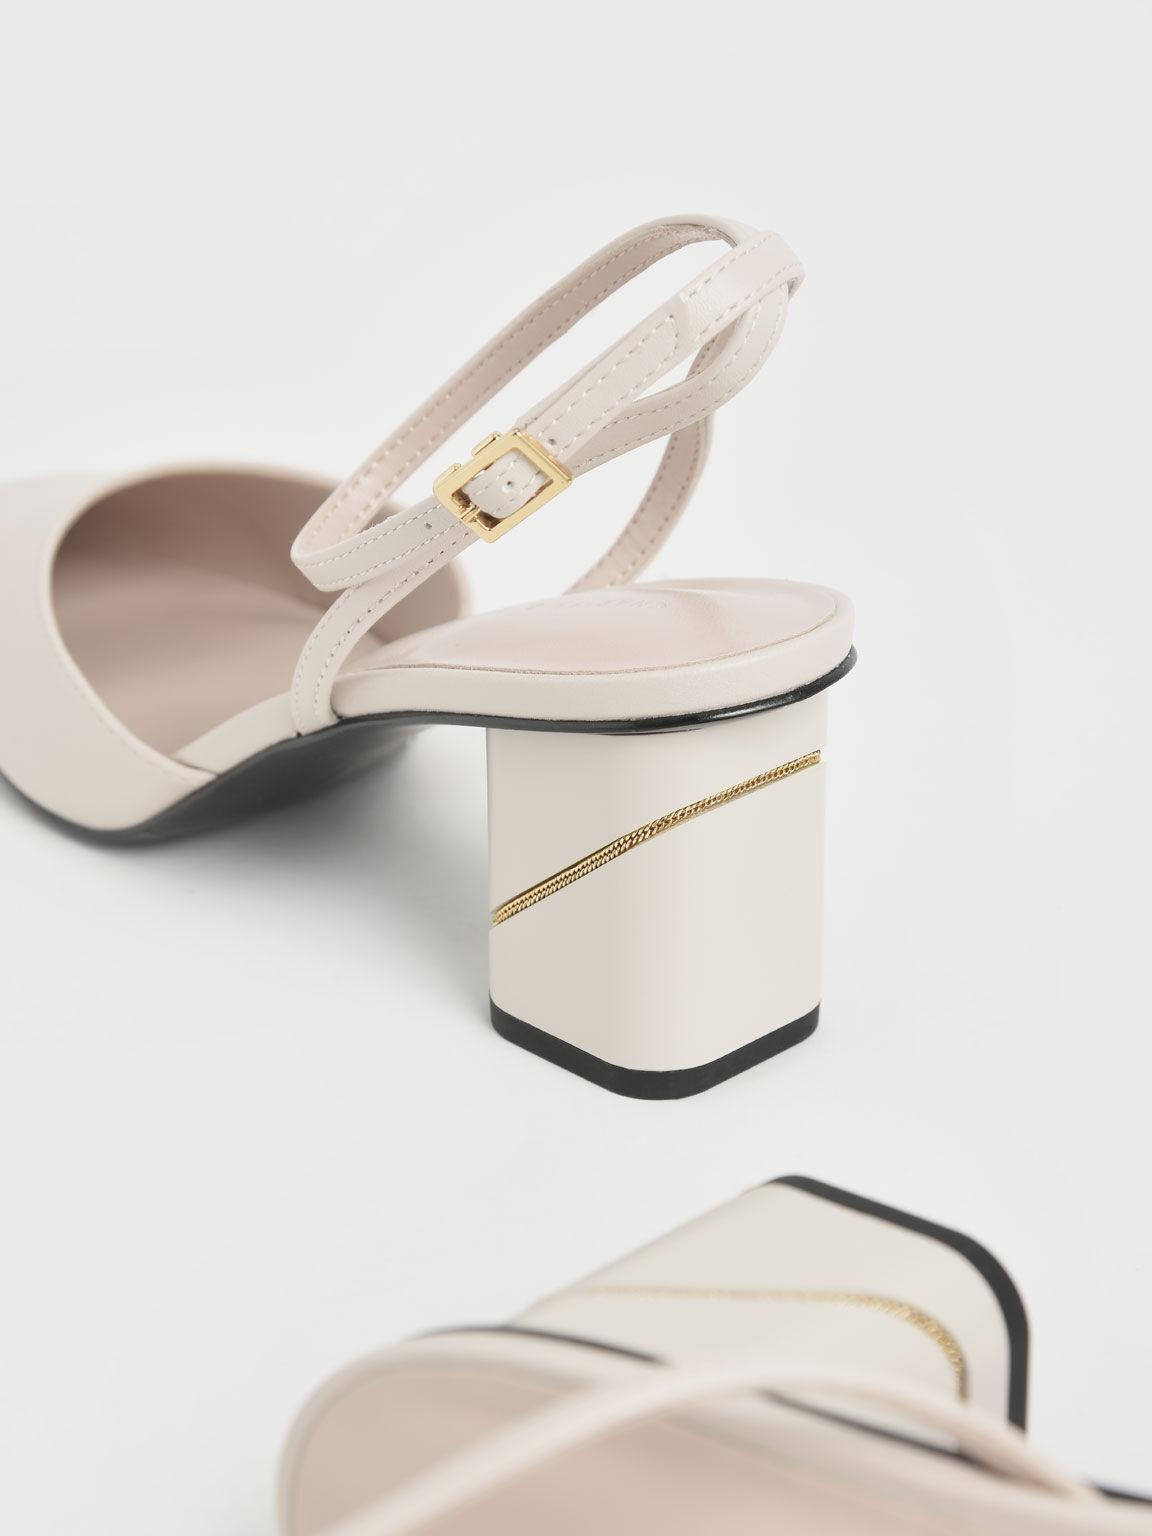 Sepatu Ankle Strap Pointed Toe Pumps, Chalk, hi-res